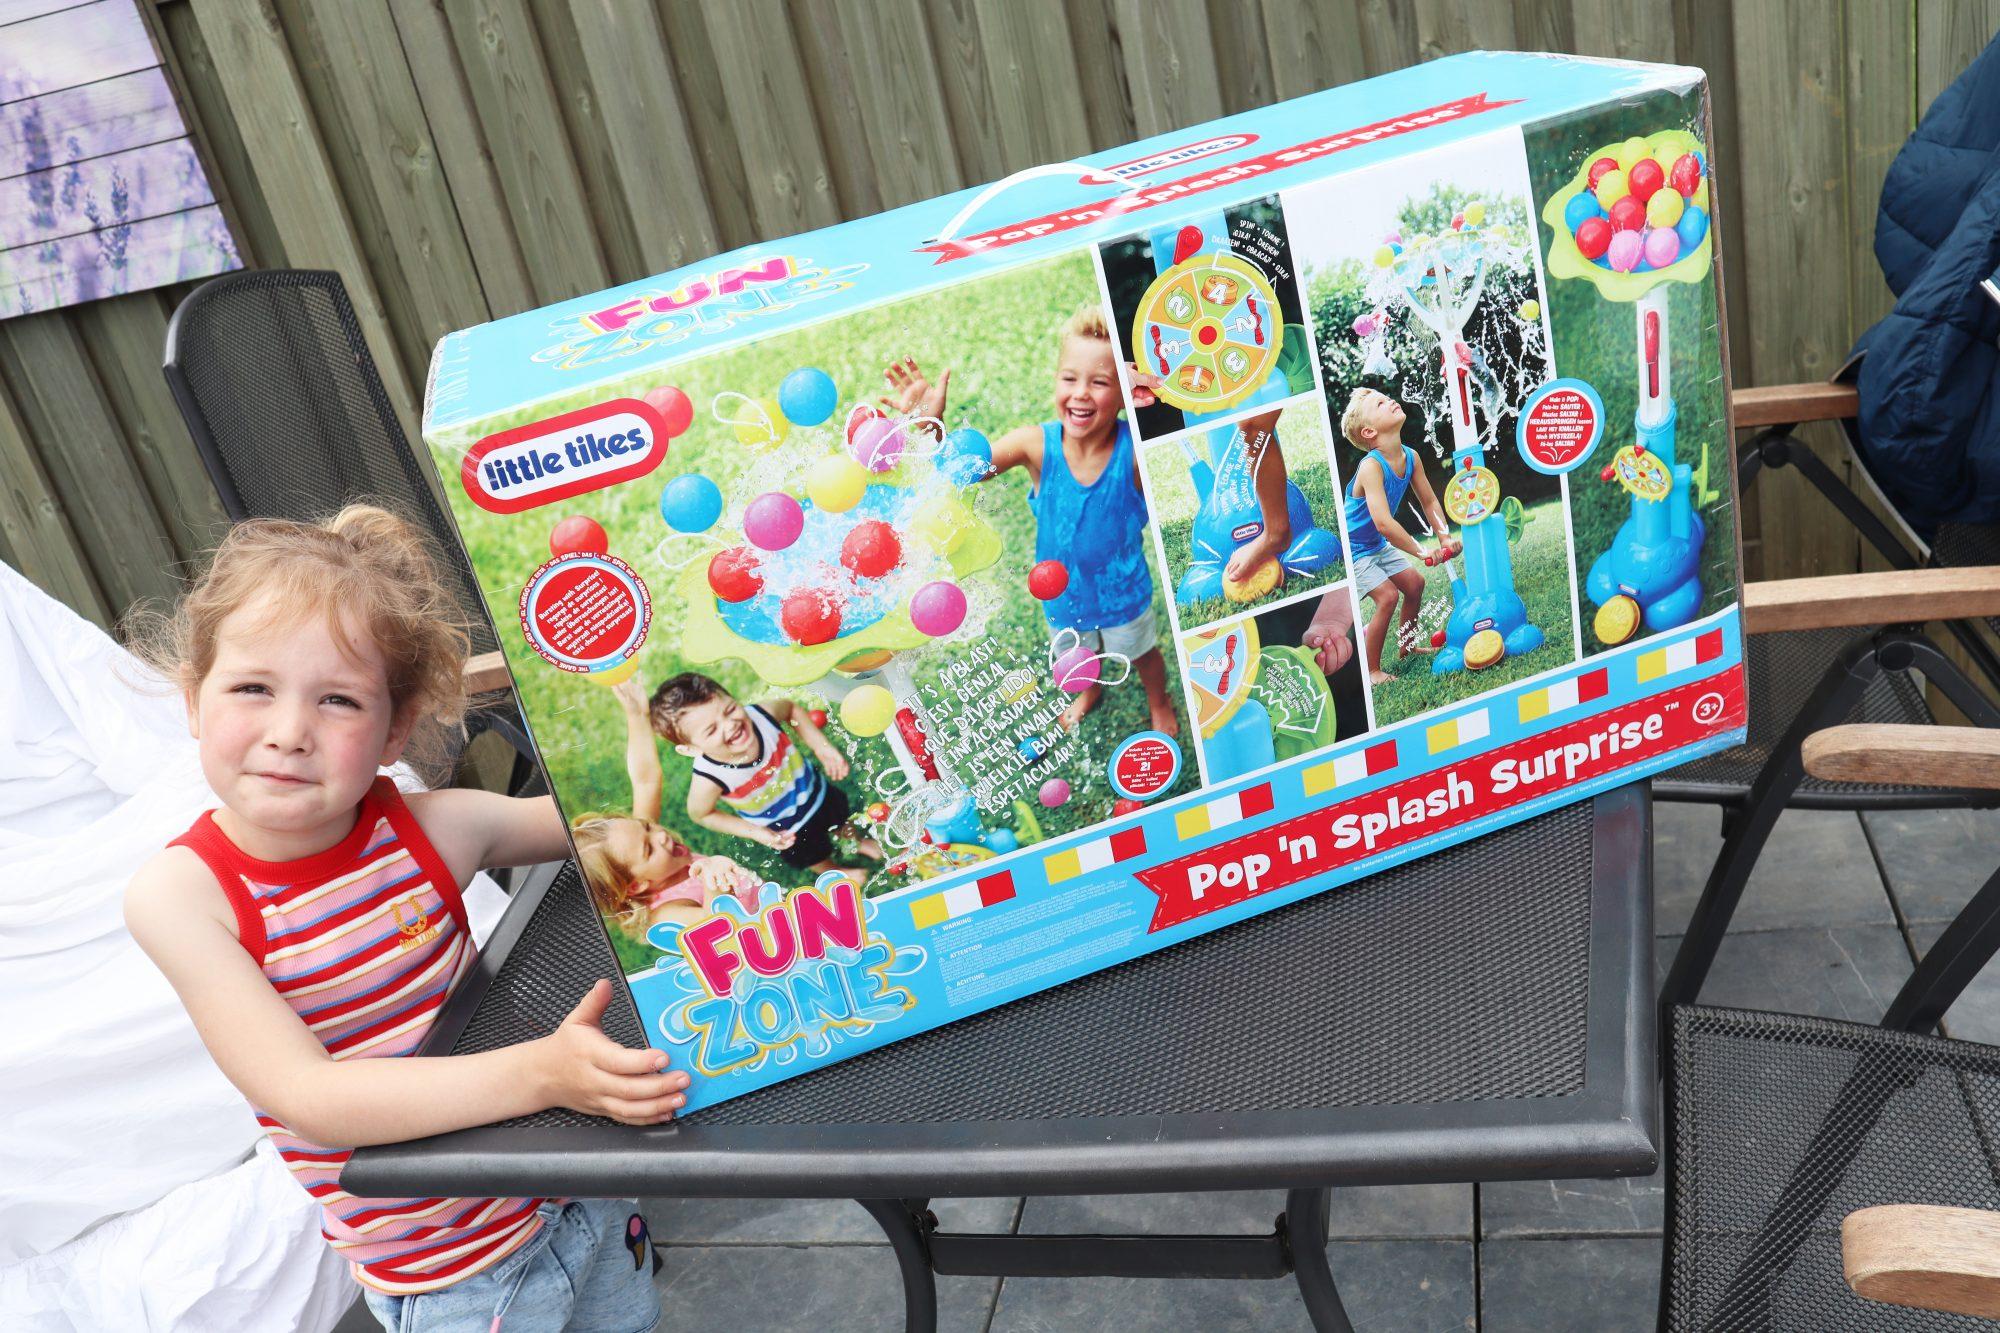 Little Tikes Fun Zone Pop 'n Splash Surprise